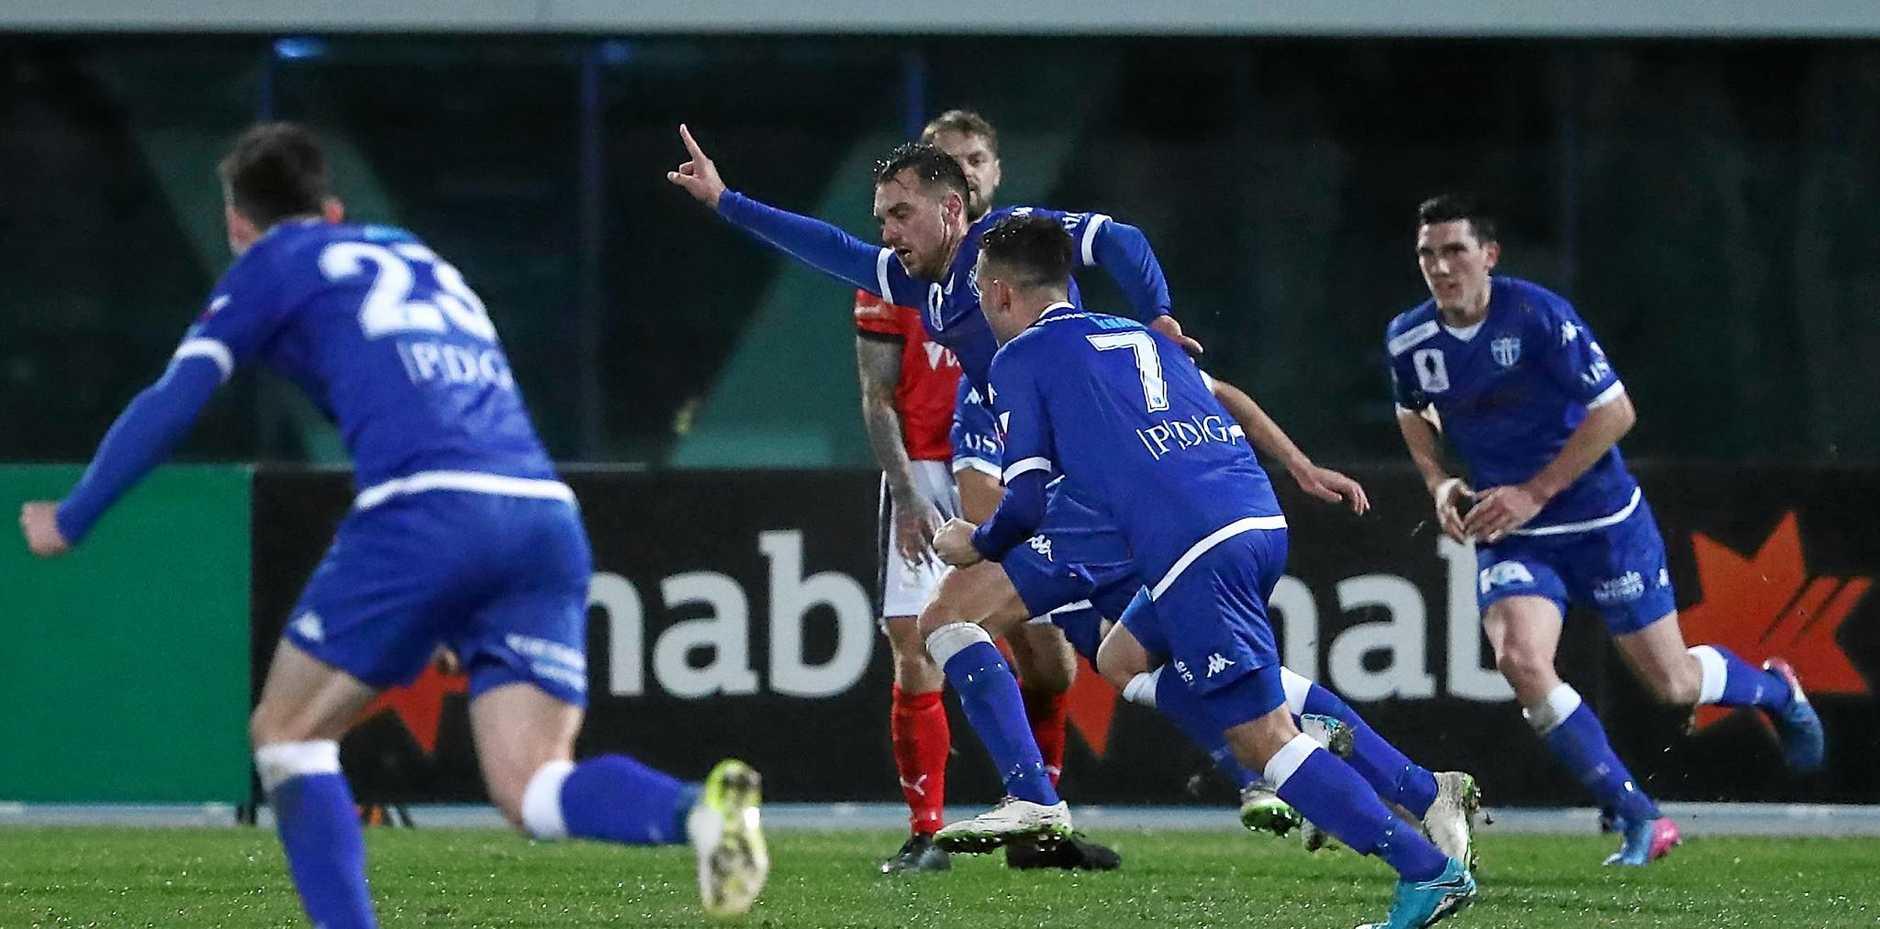 Milos Lujic of South Melbourne celebrates after scoring against Edgeworth.